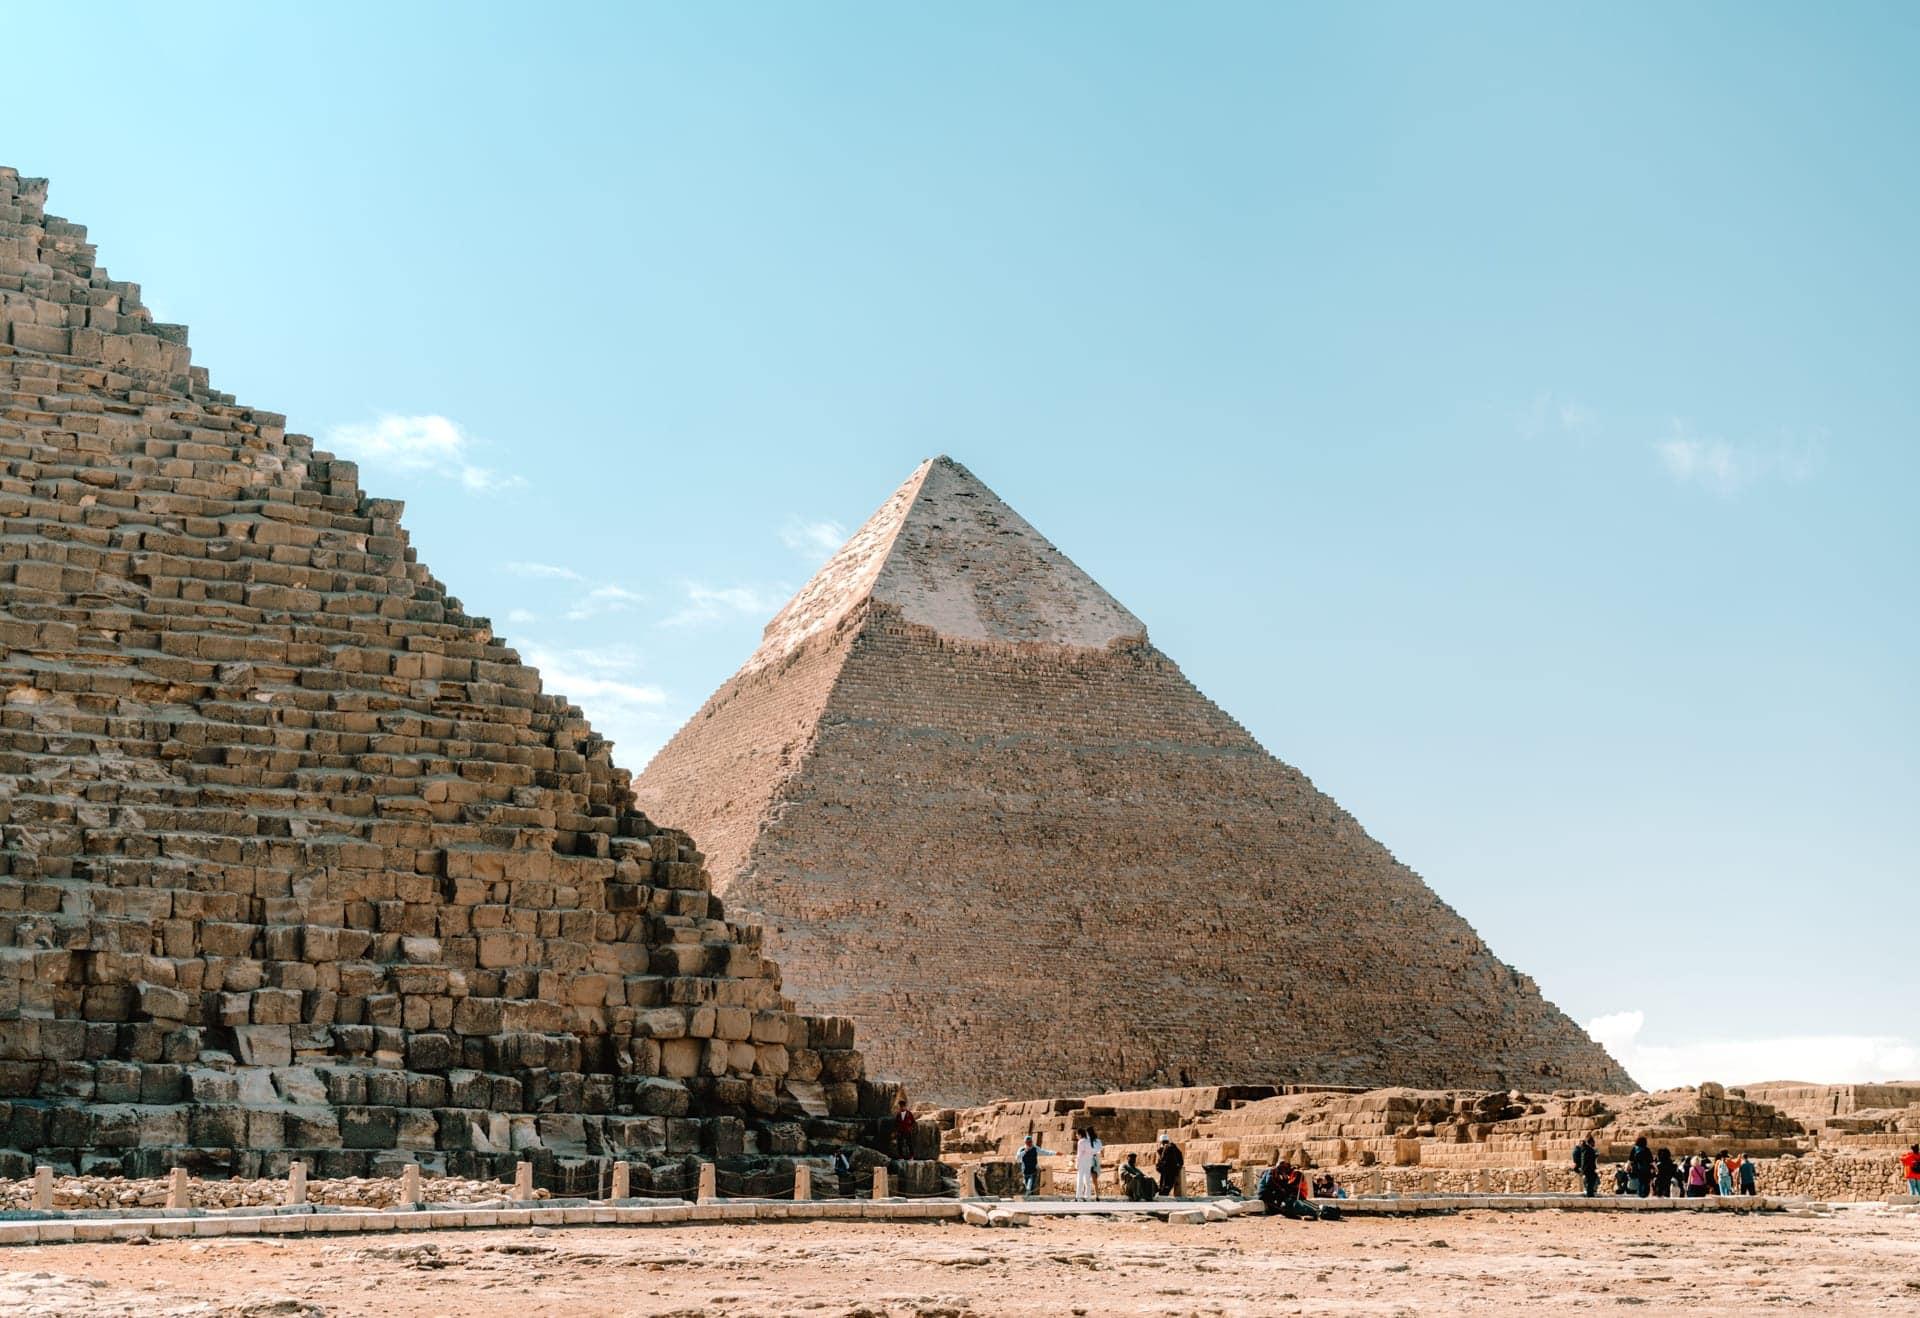 egypt cairo visit pyramids